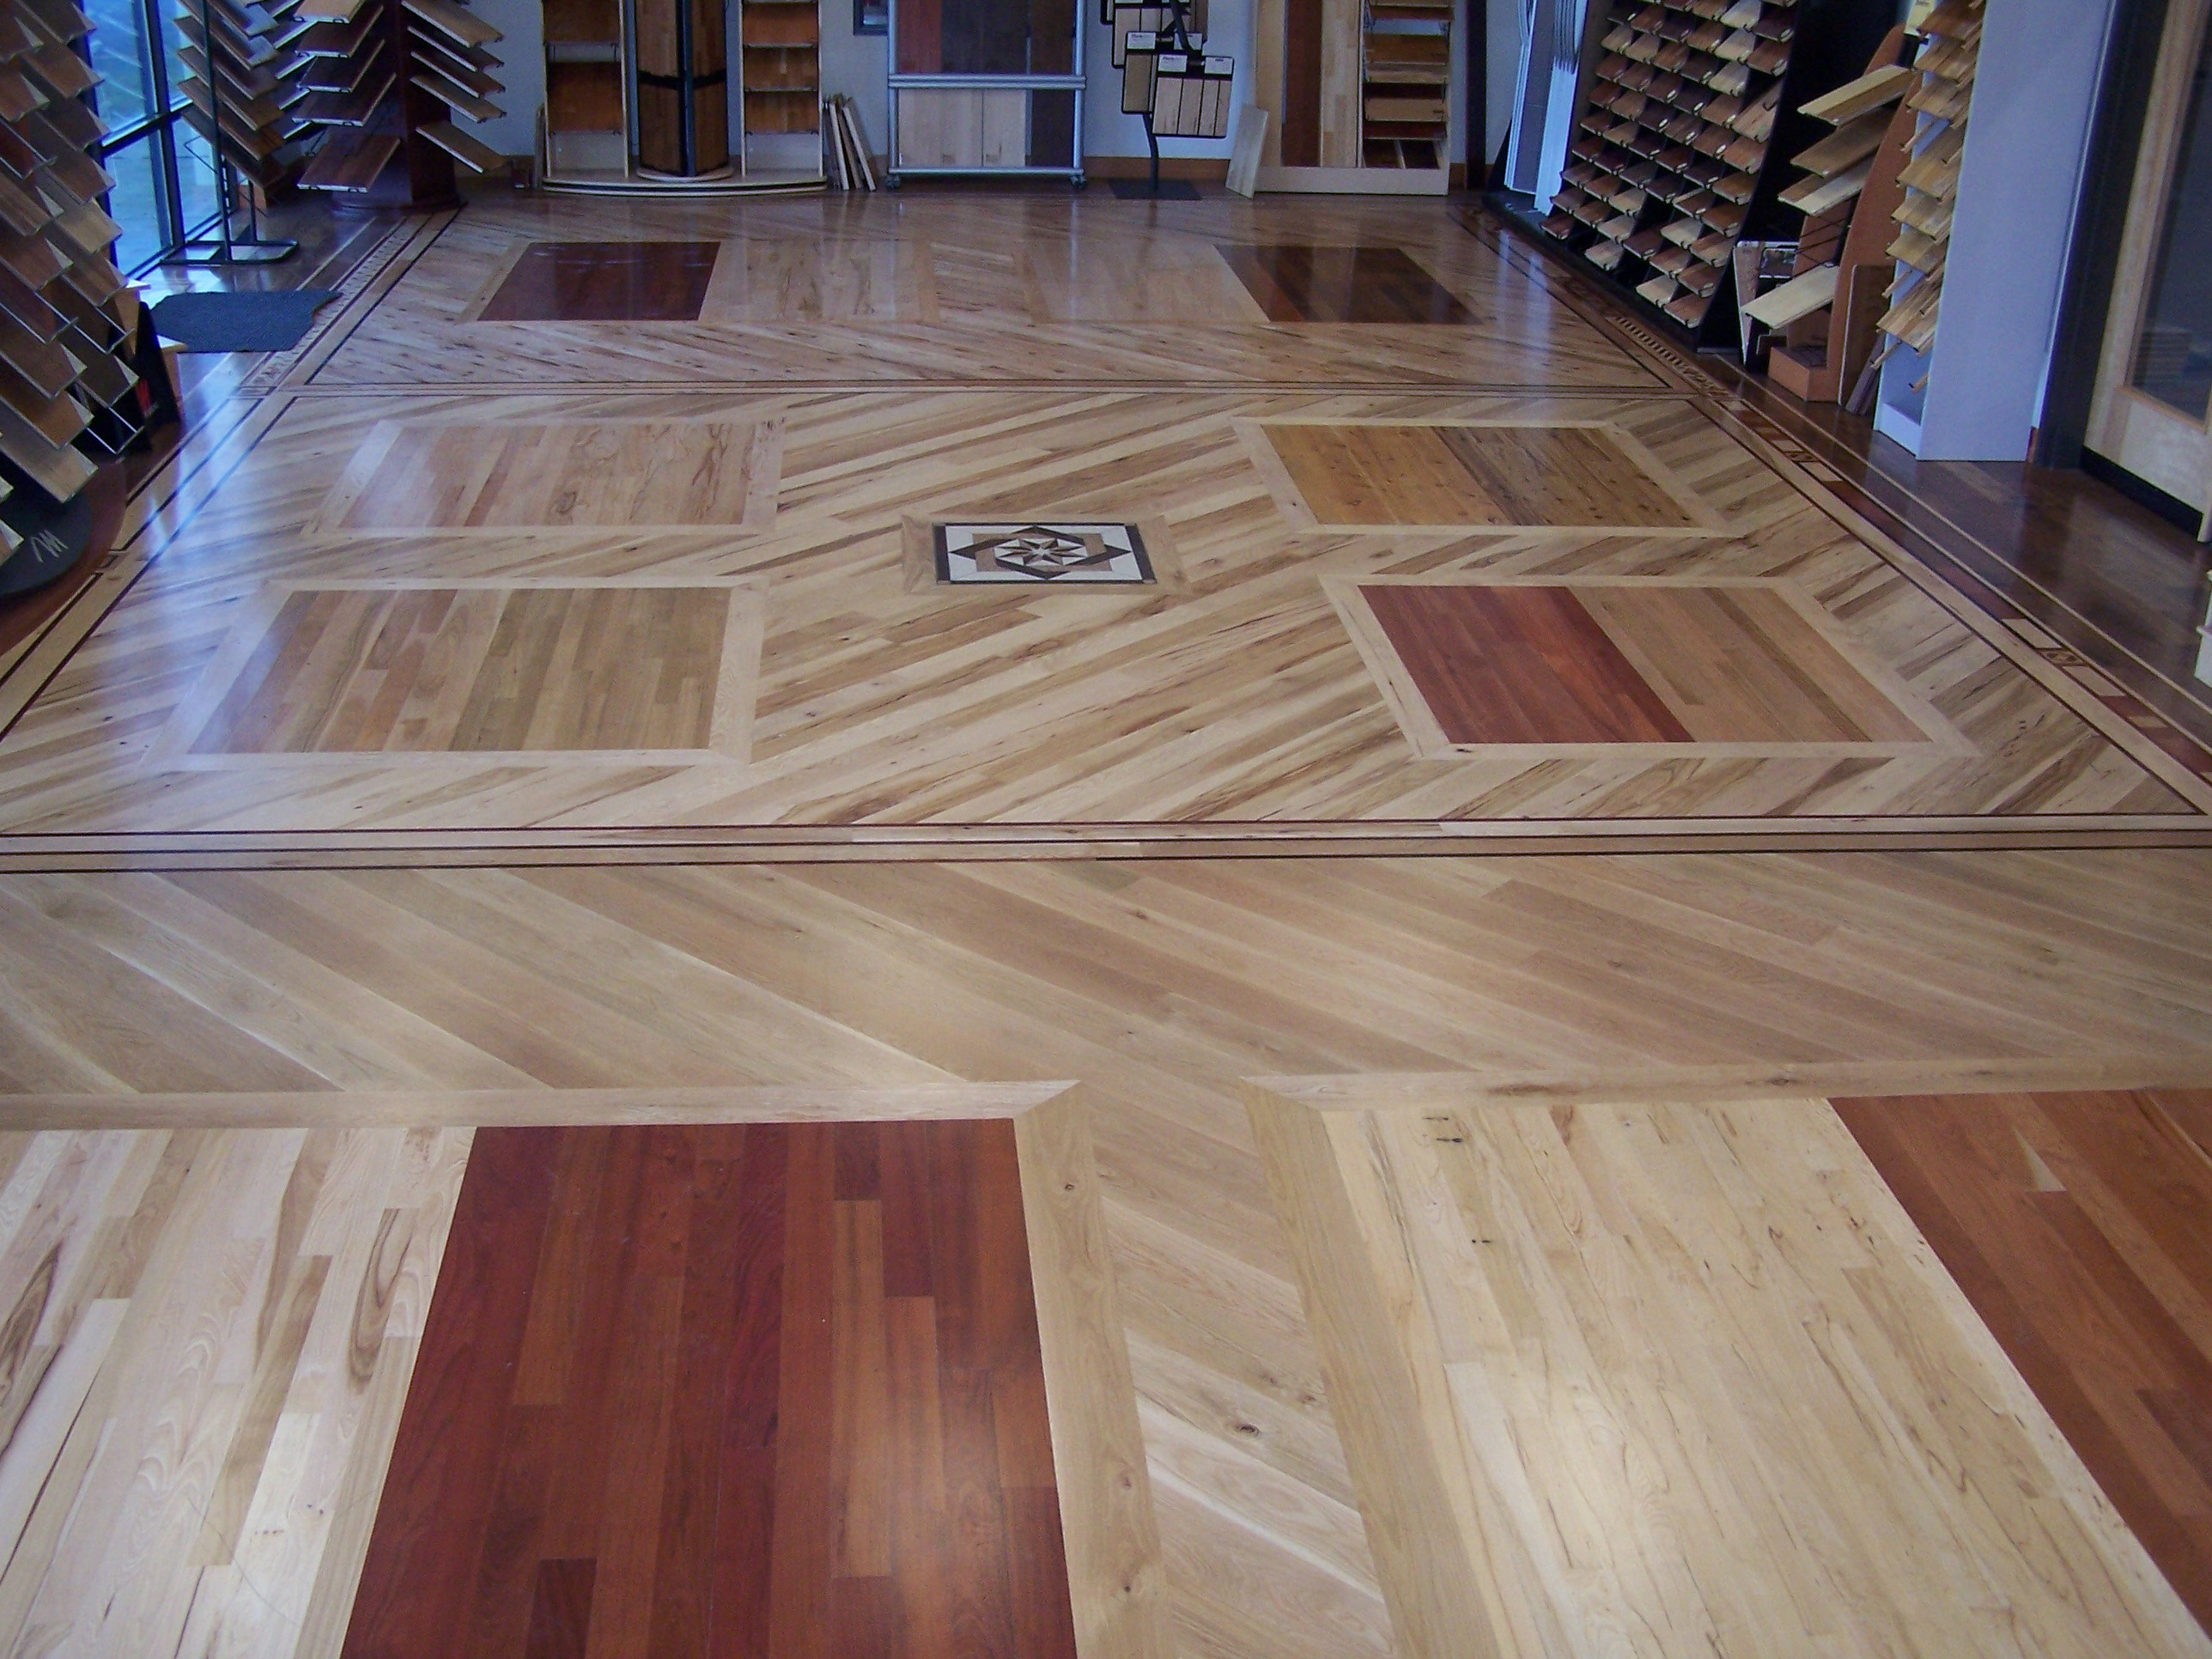 hardwood floor refinishing eugene oregon of cascade pacific flooring reward hardwood flooring concord carpet regarding cascade pacific flooring hardwood flooring gallery eugene or